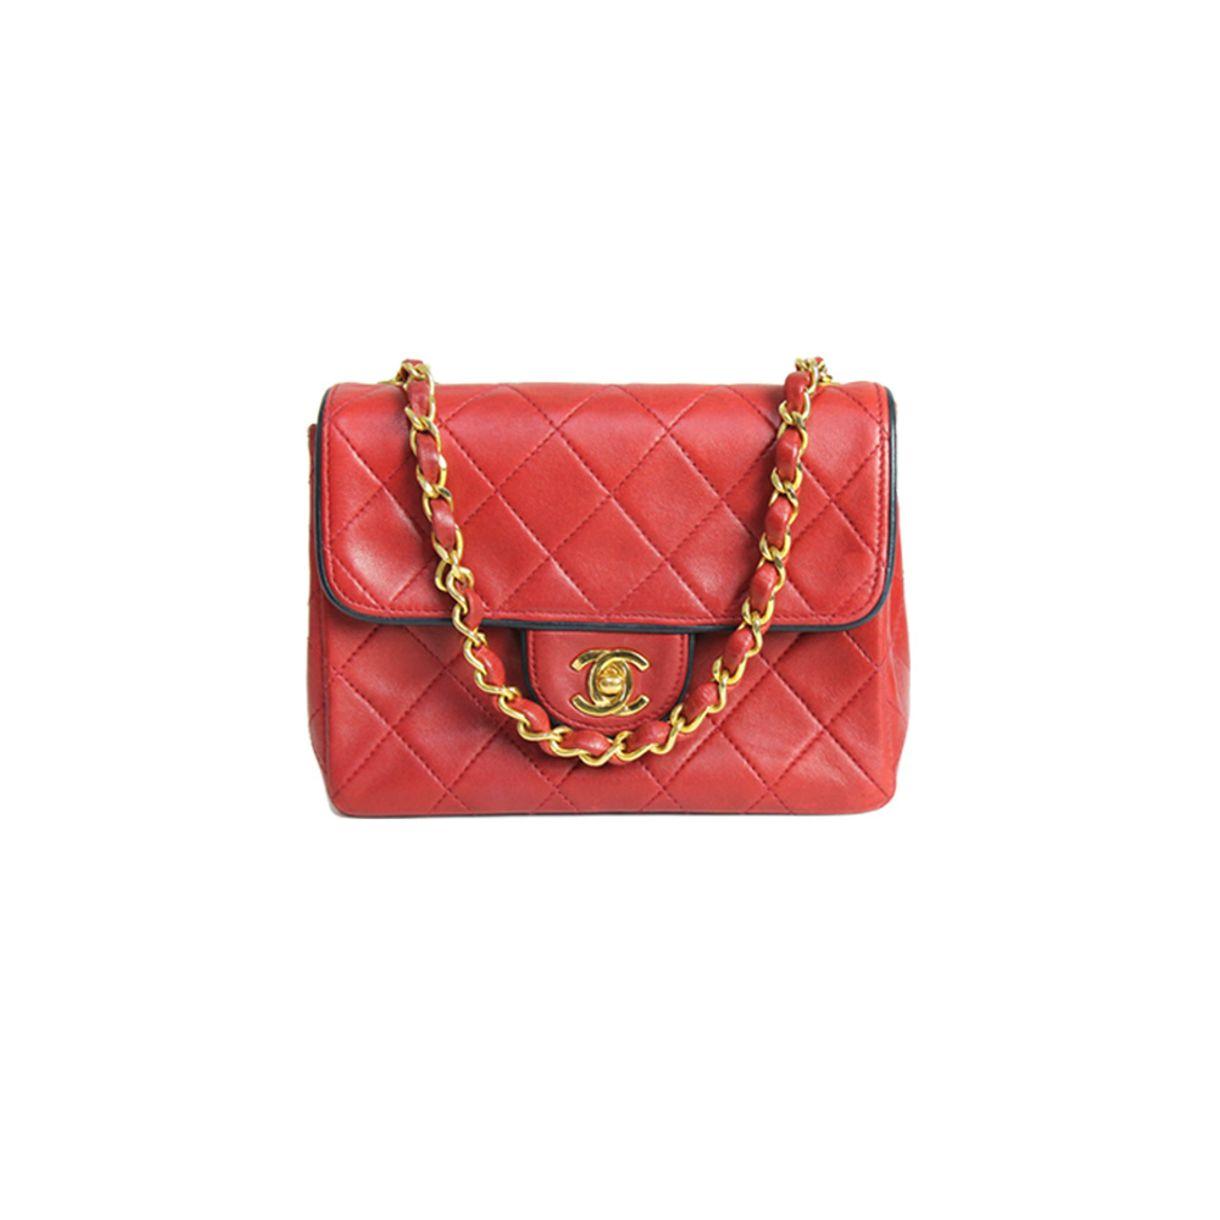 Bolsa-Chanel-Classic-Mini-Square-Vermelha-Lambskin